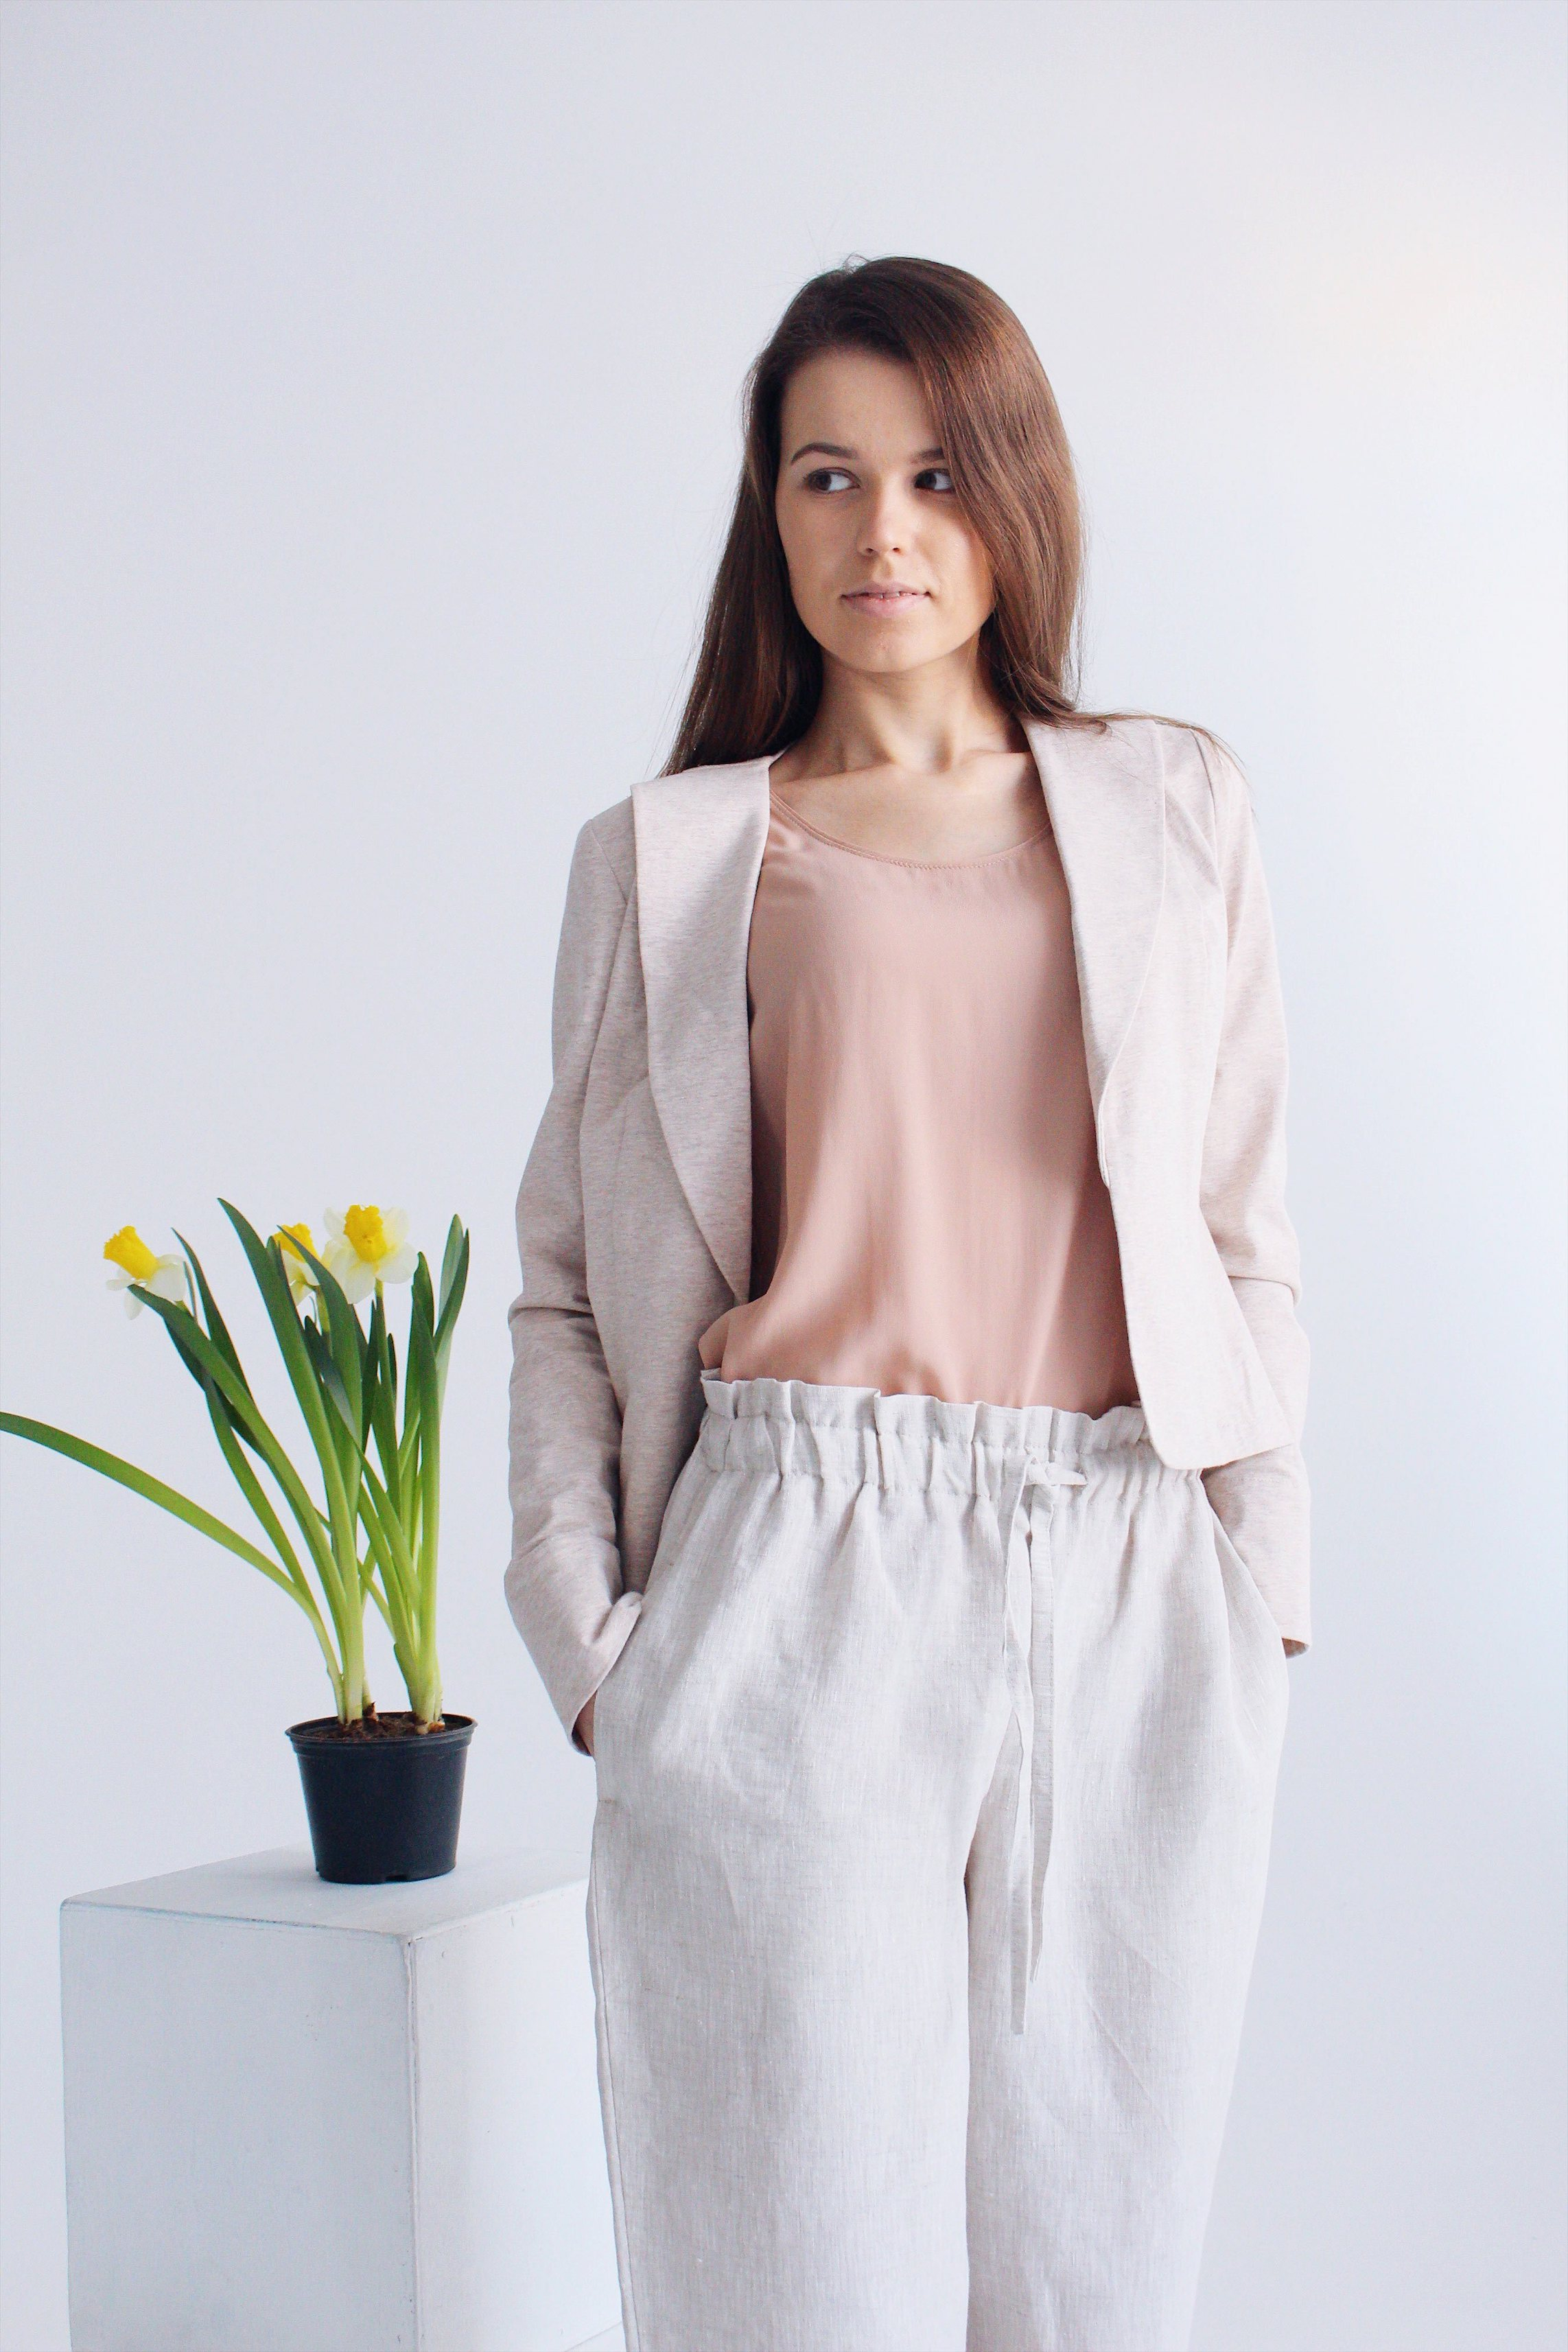 Made To Order Clothing - Dressarte